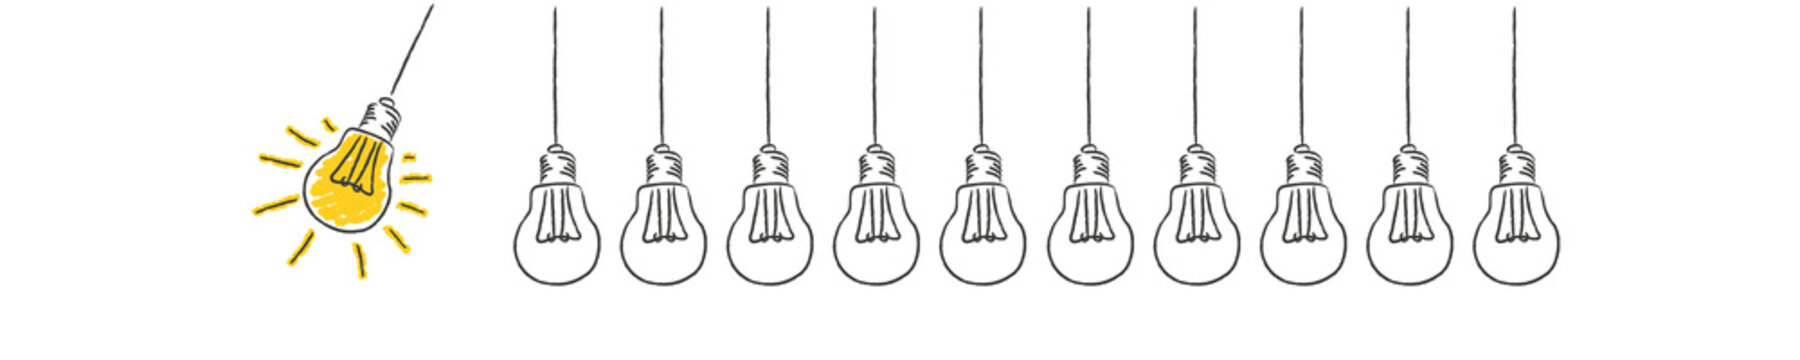 Panorama Banner Pendel aus Glühbirnen Idee Innovation